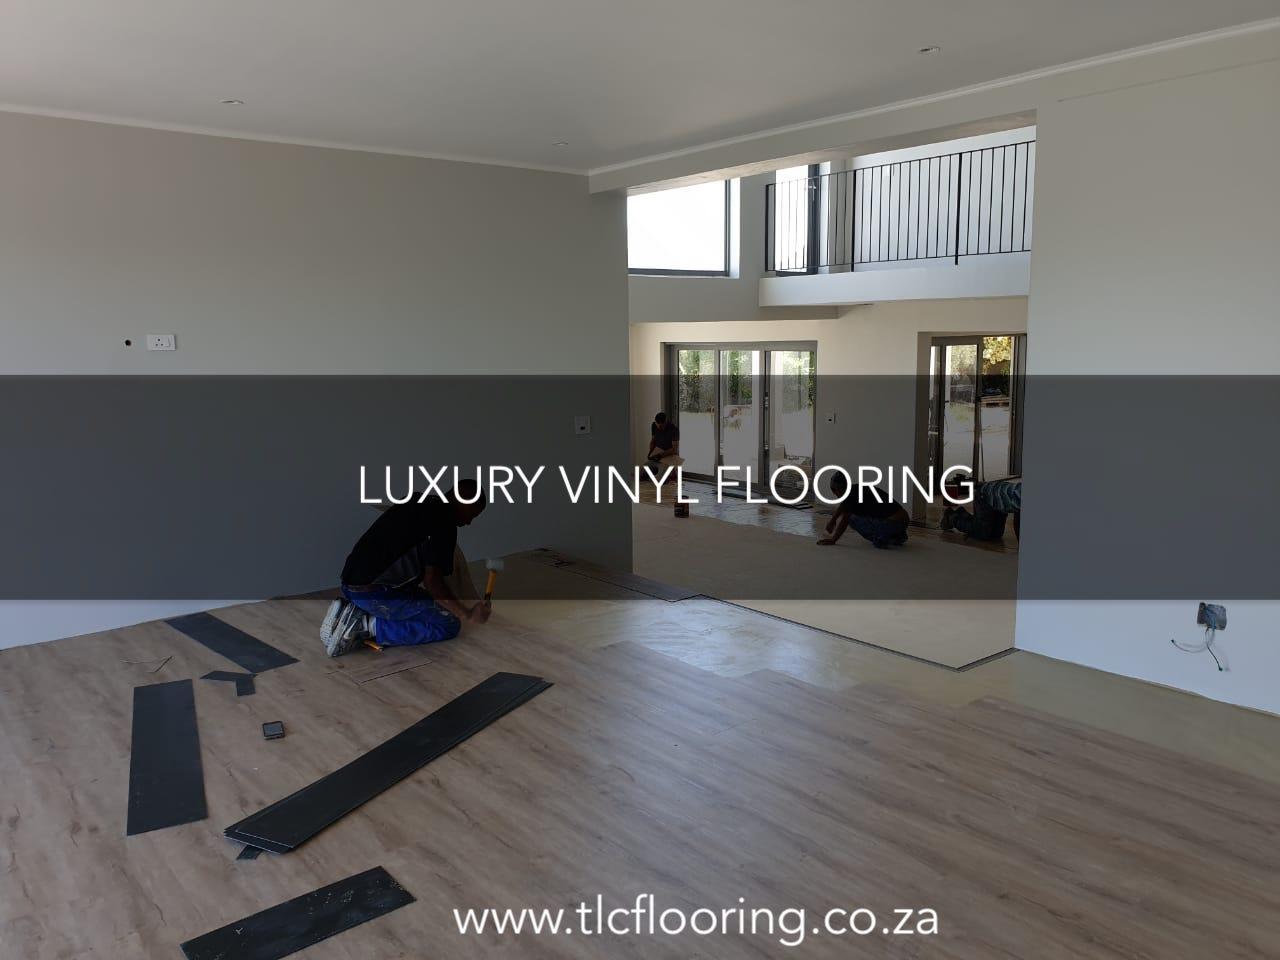 luxury vinyl flooring cape town tlc flooring 1b